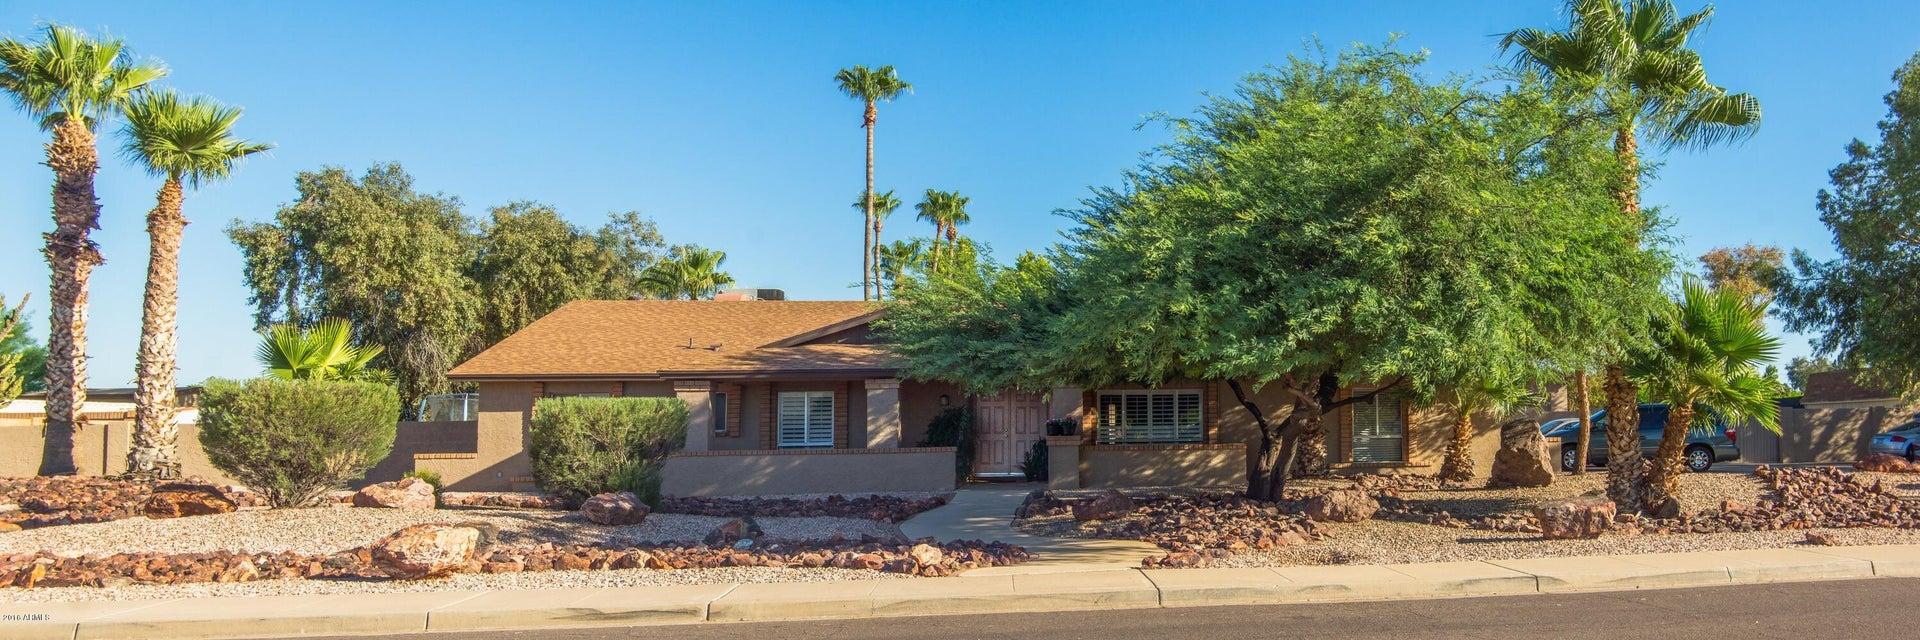 $578,900 - 6Br/4Ba - Home for Sale in Longhorn Ranch 2 Lot 1-131, Glendale